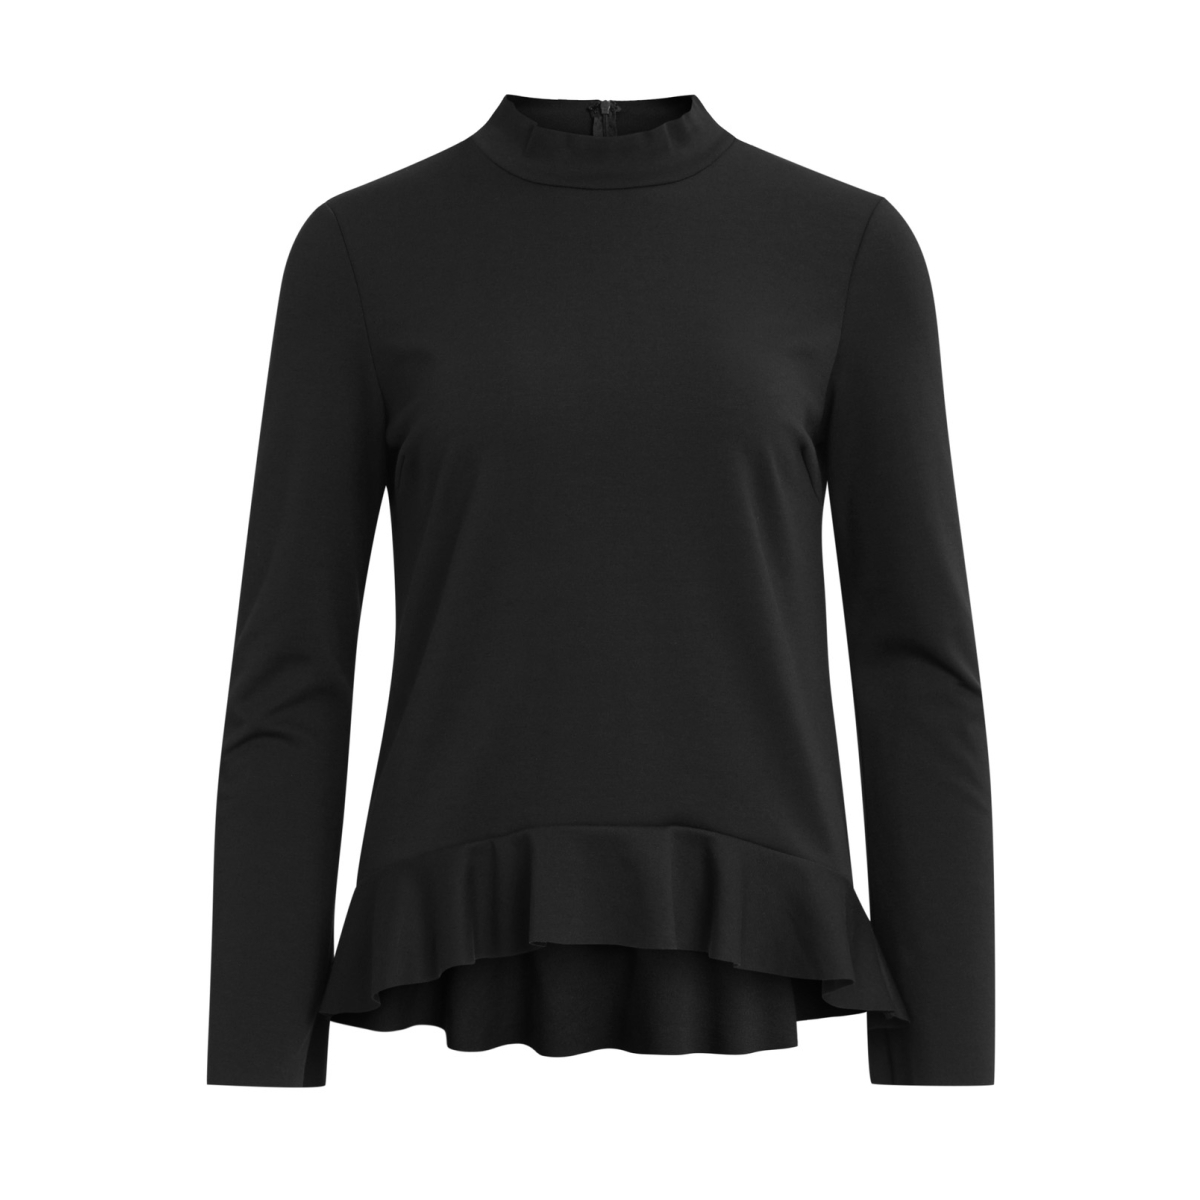 vifaunas l/s flounce top/dc 14043196 vila t-shirt black